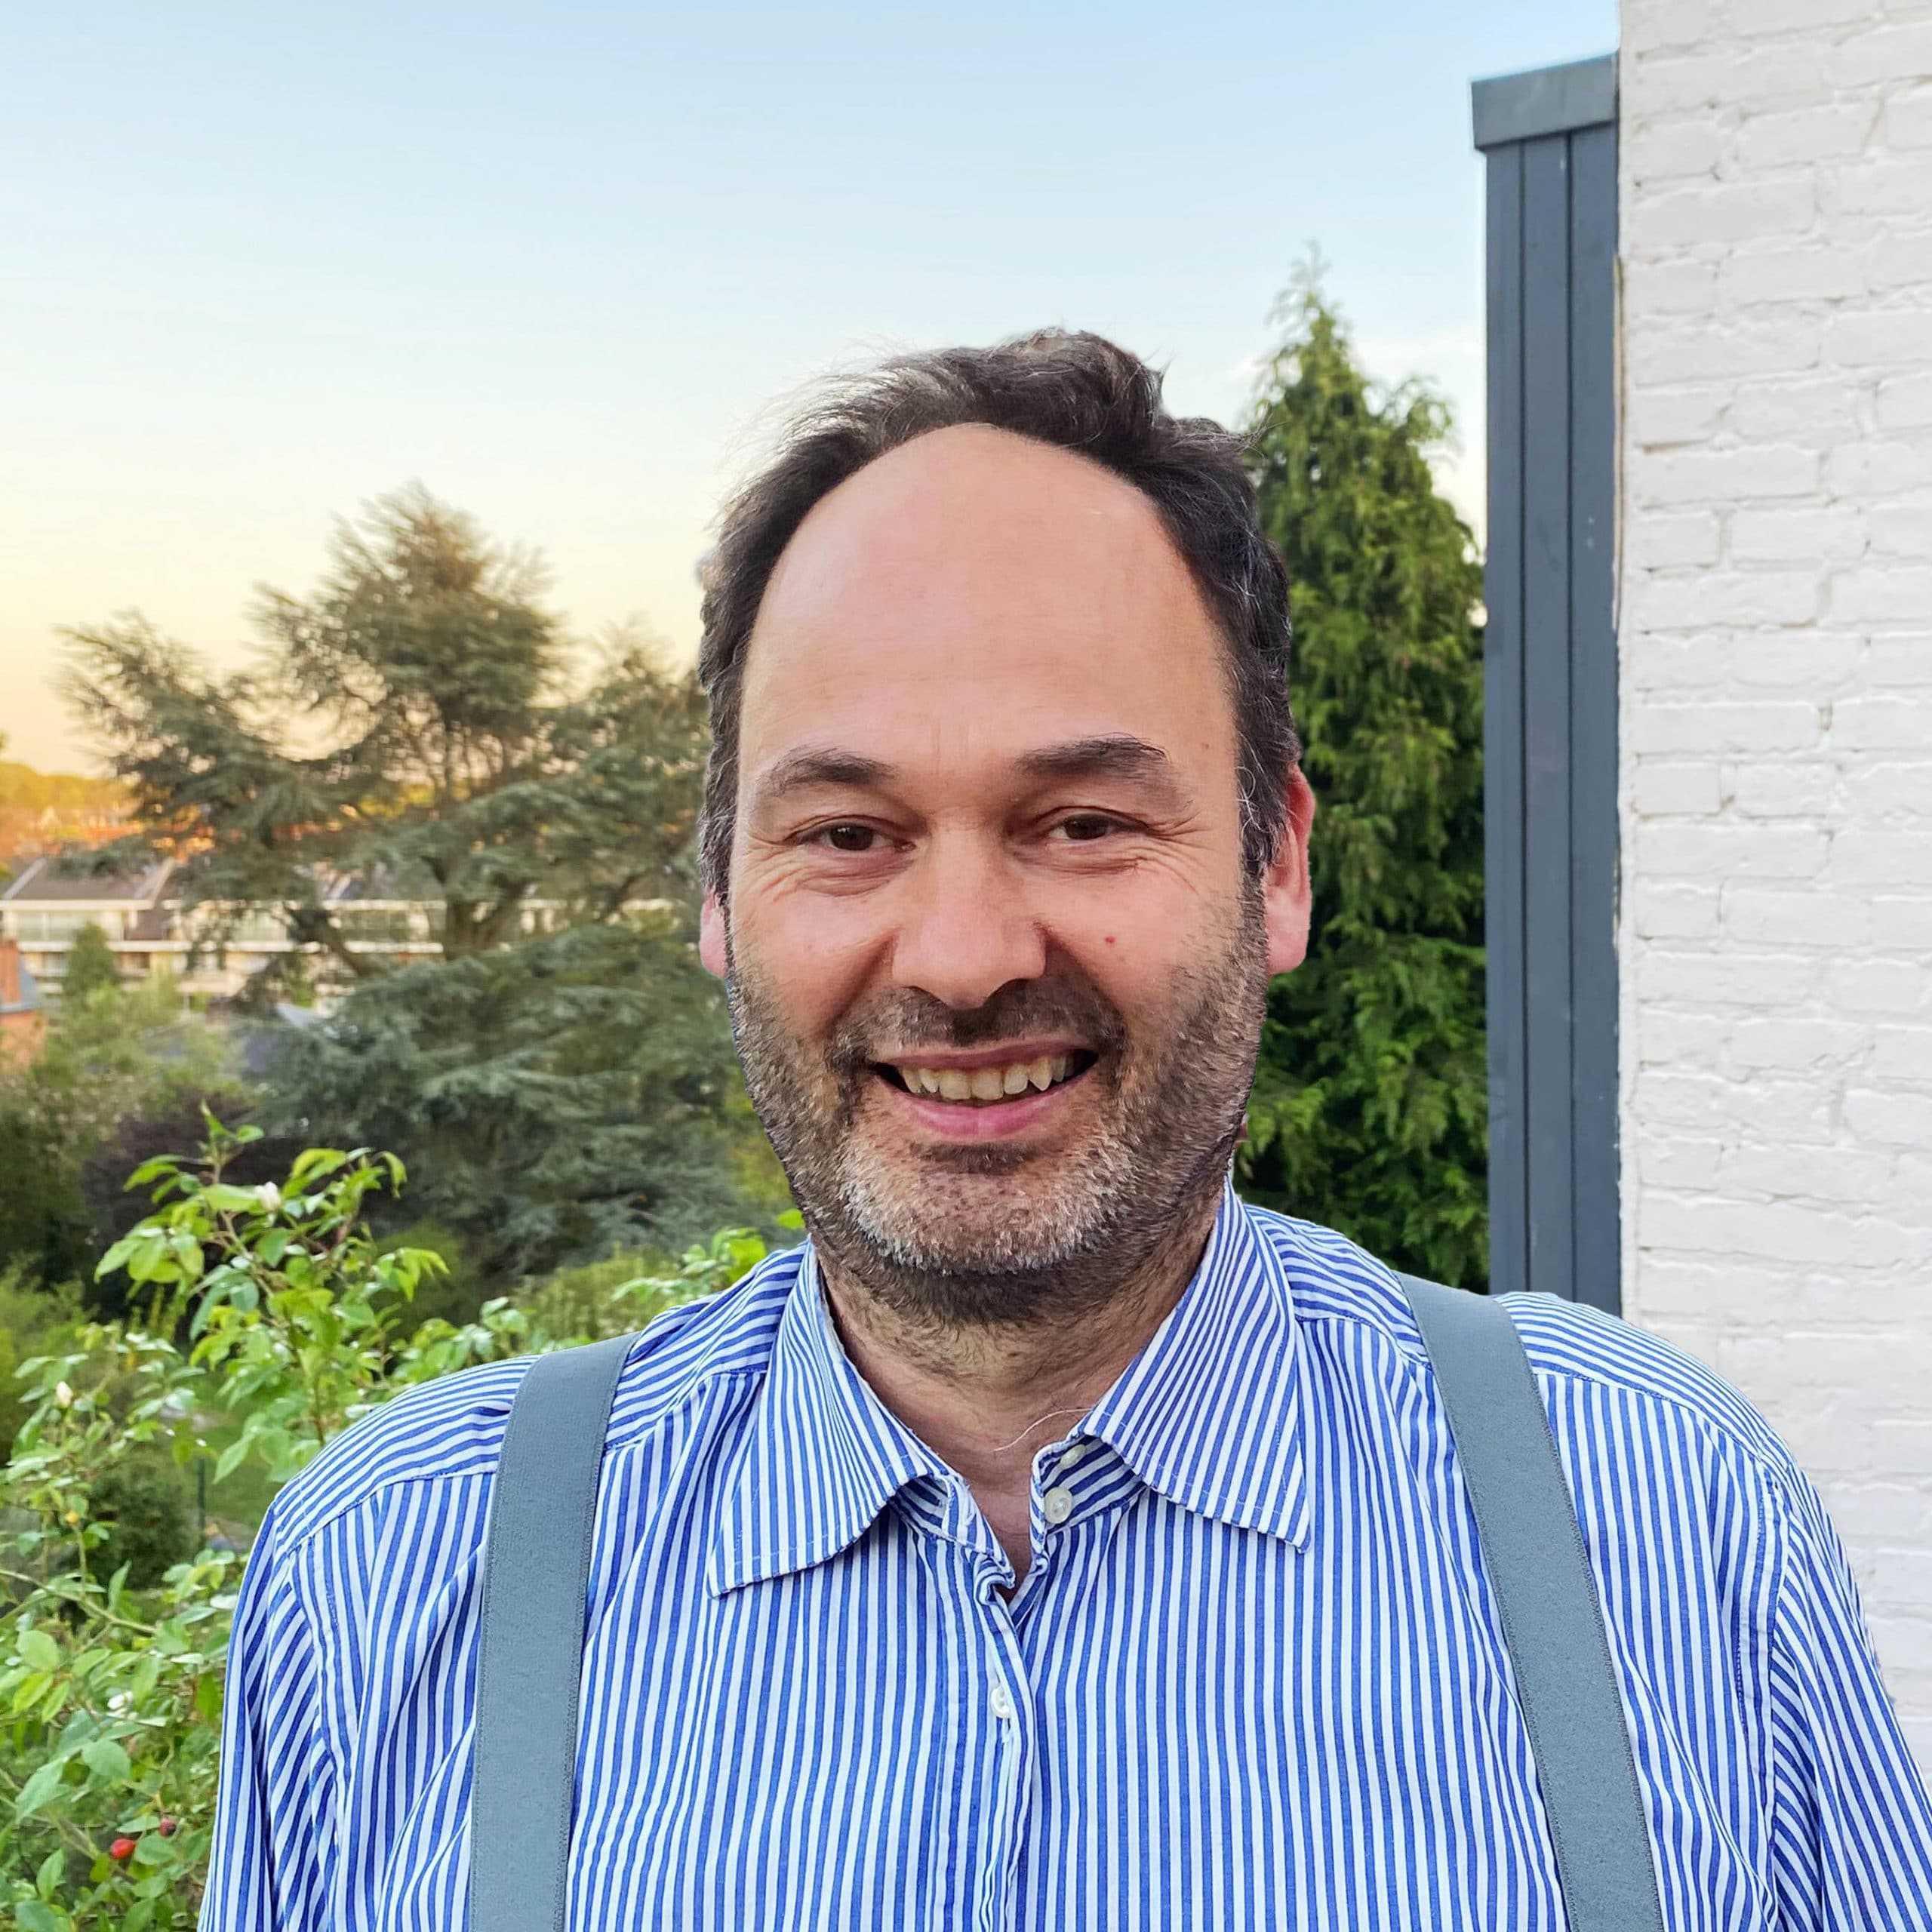 Carsten Jürgens